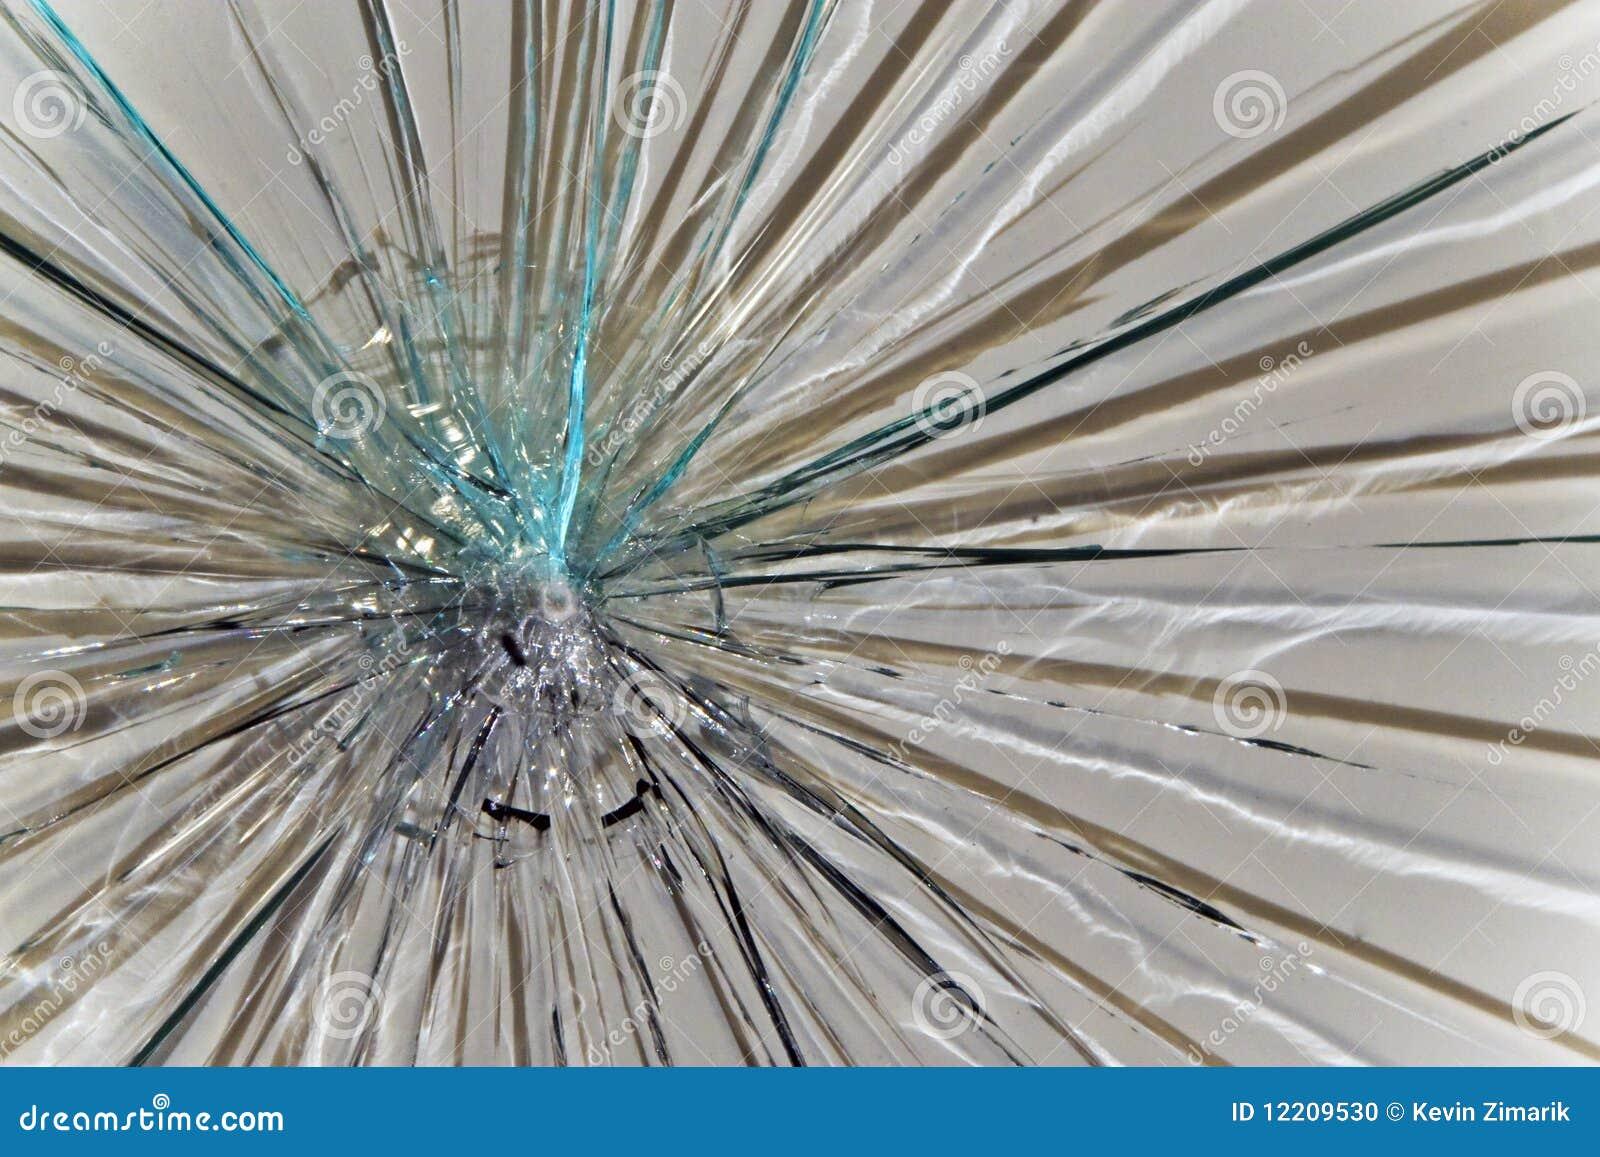 Broken Glass Stock Photo Image 12209530